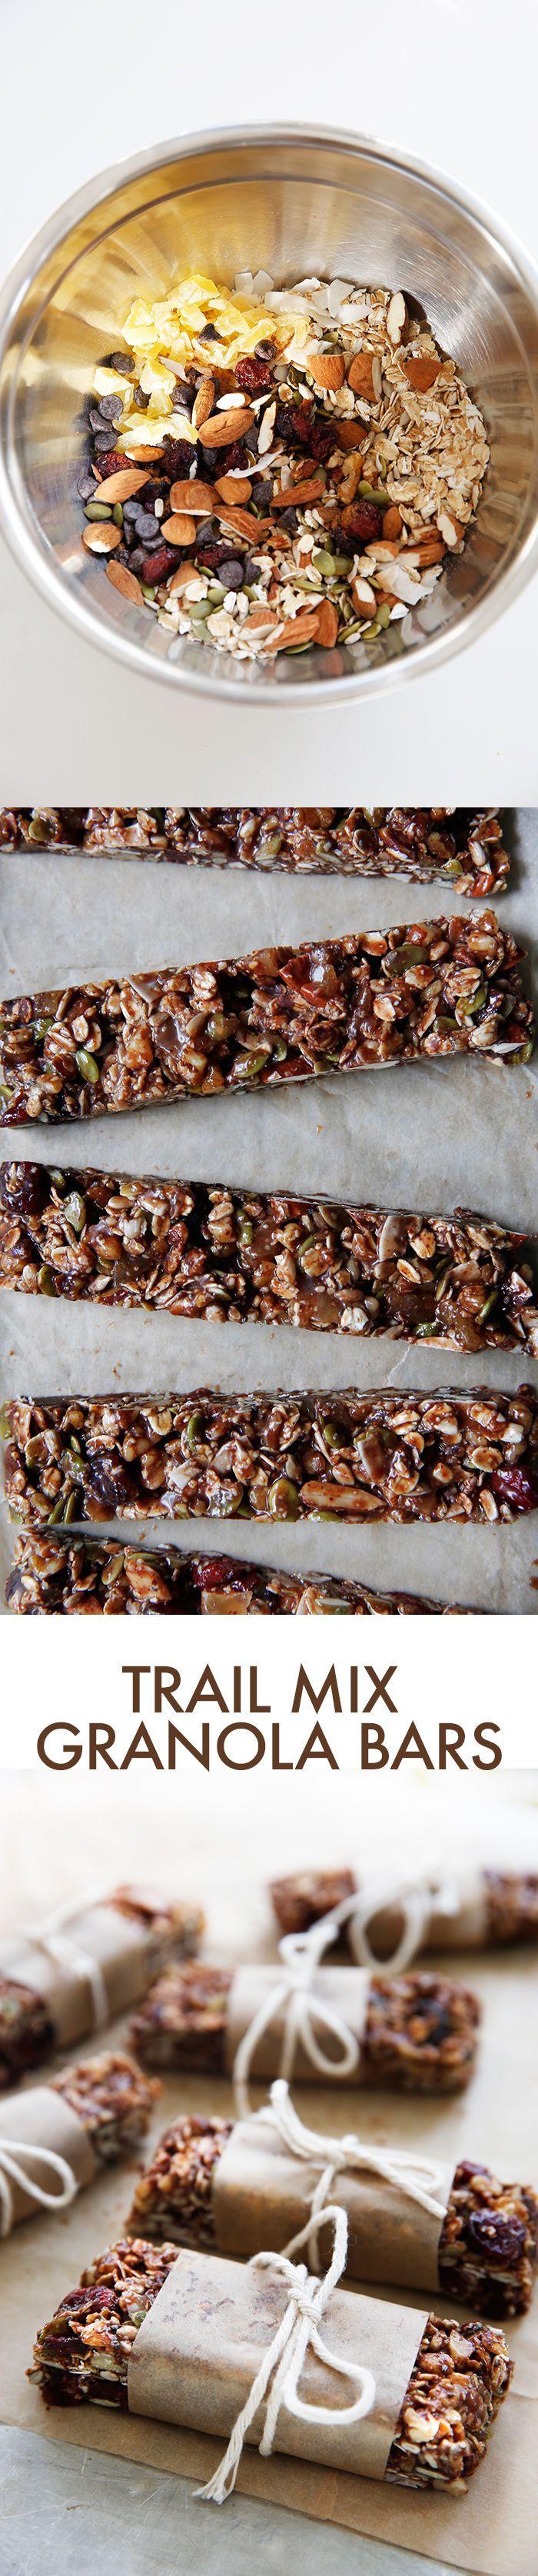 Trail Mix Granola Bars (gluten-free) | Lexi's Clean Kitchen